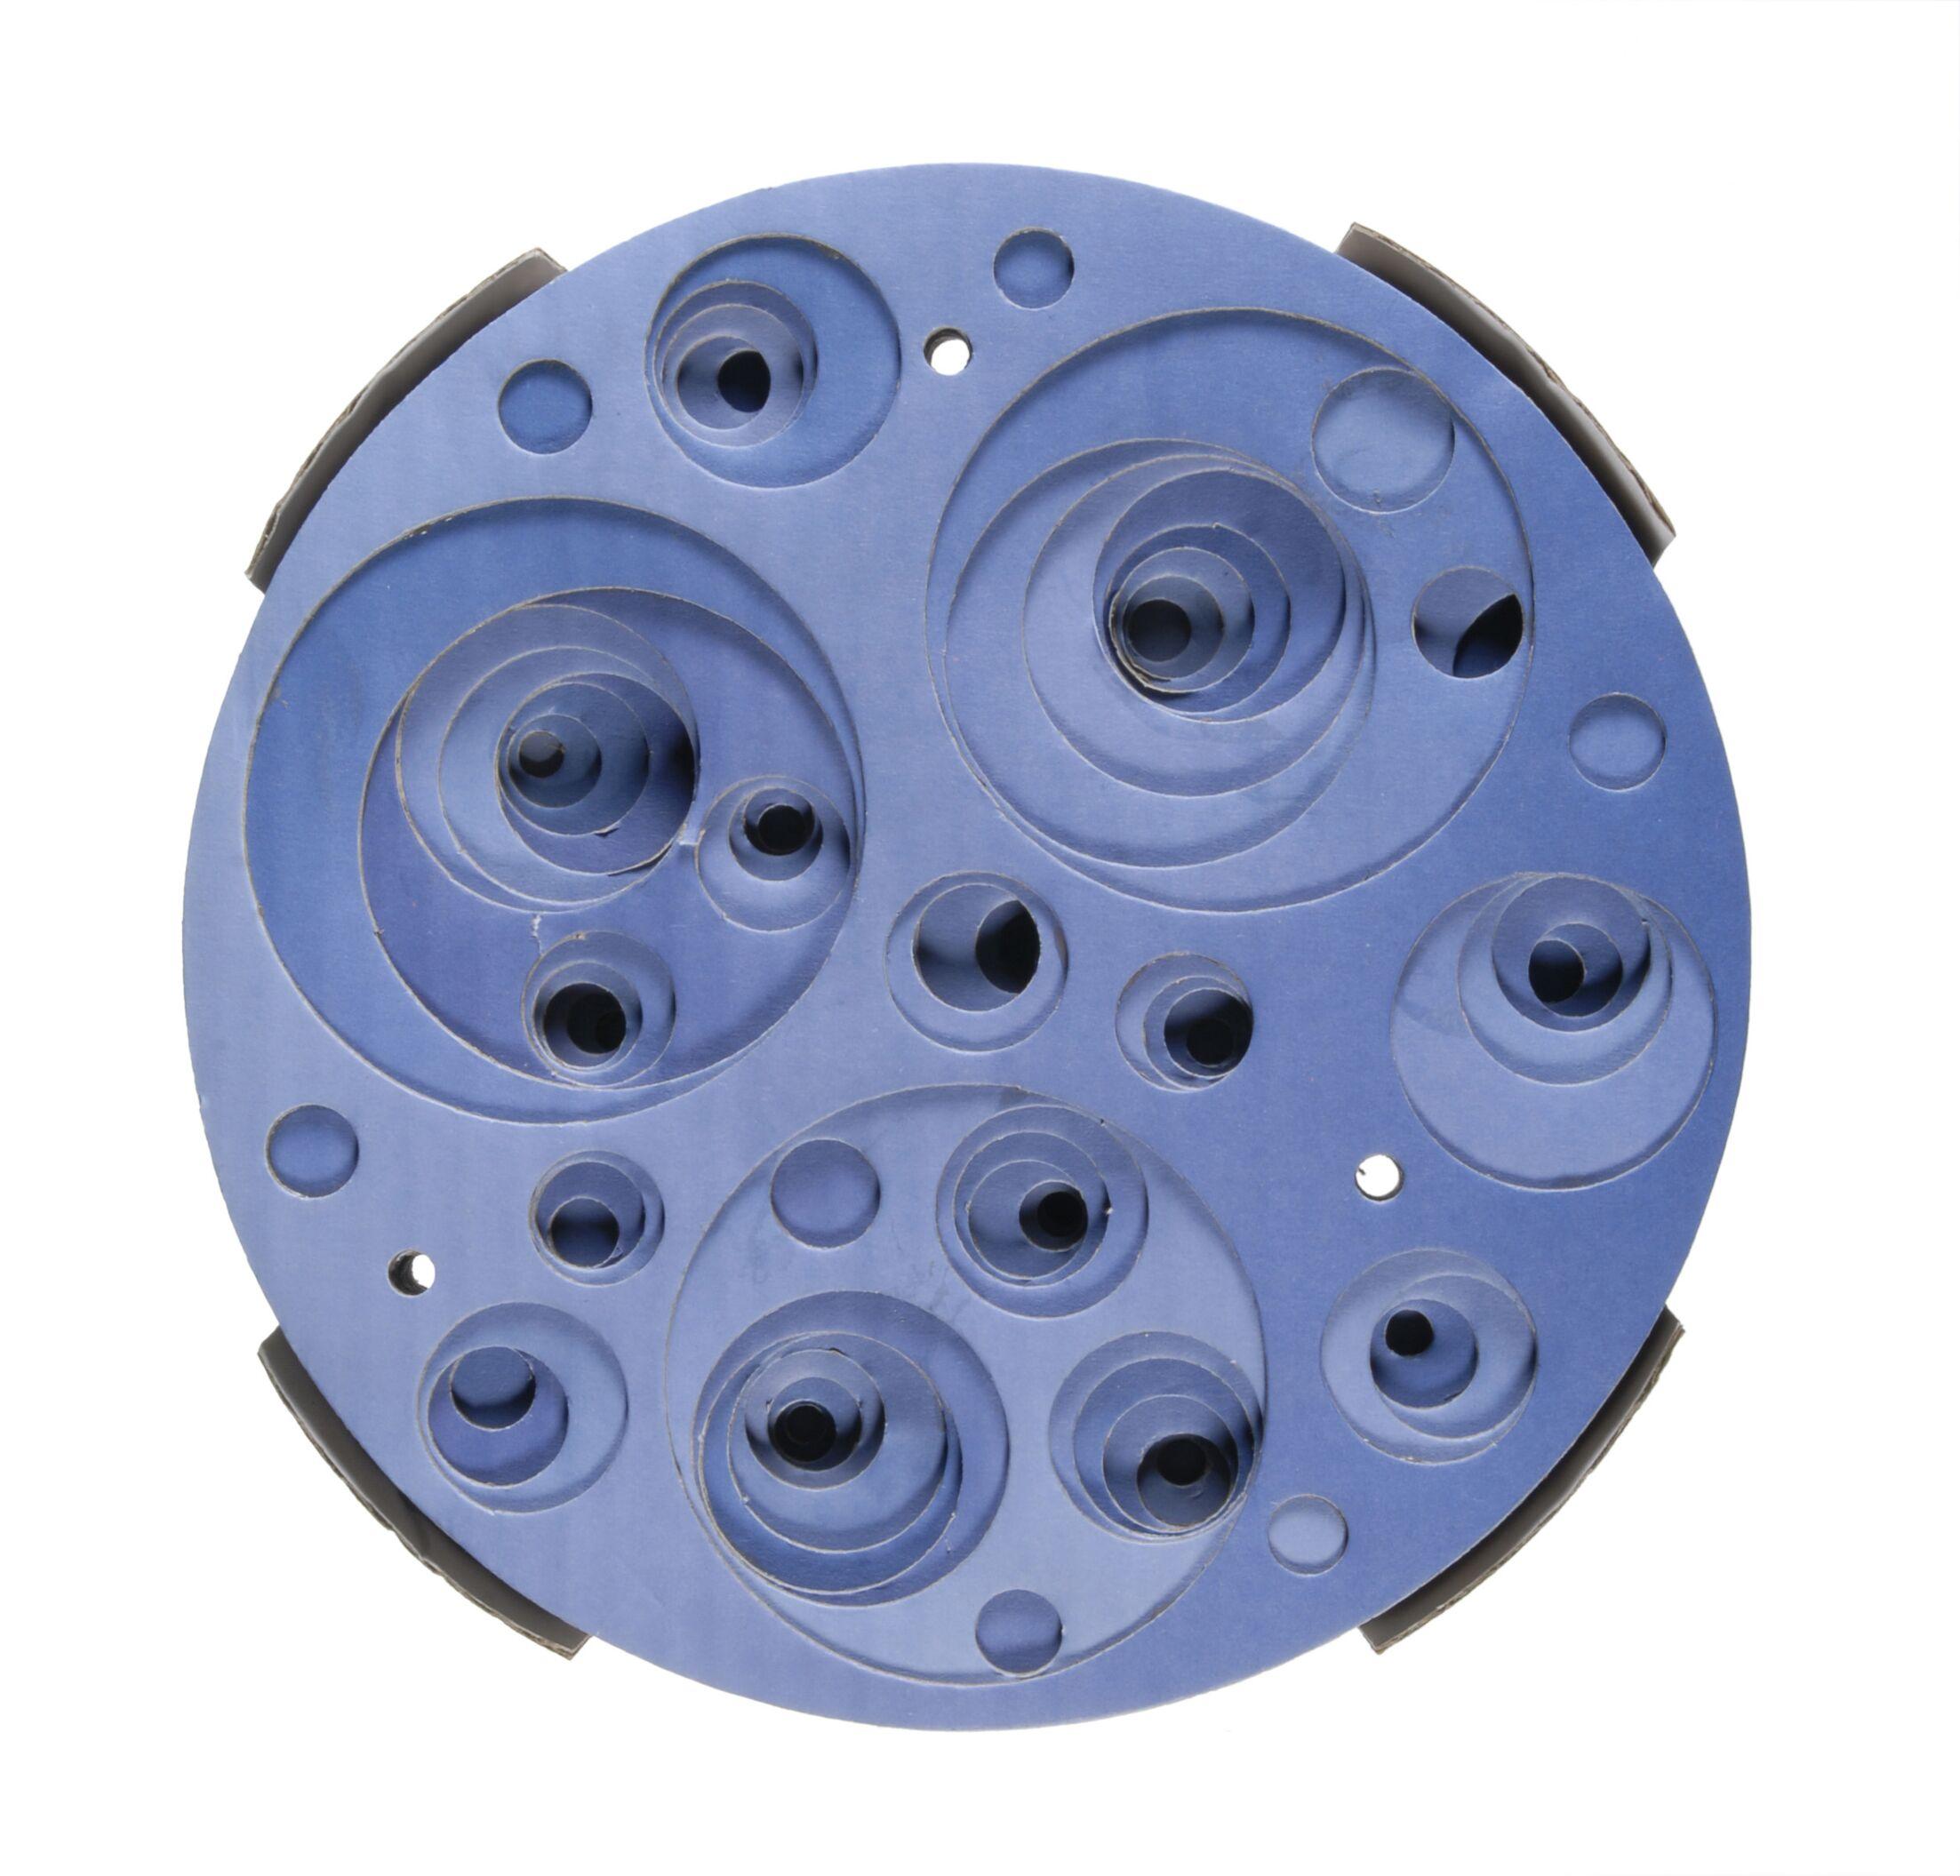 Catit Design Senses Corrugated Scratching Pad Color: Blue Swirl